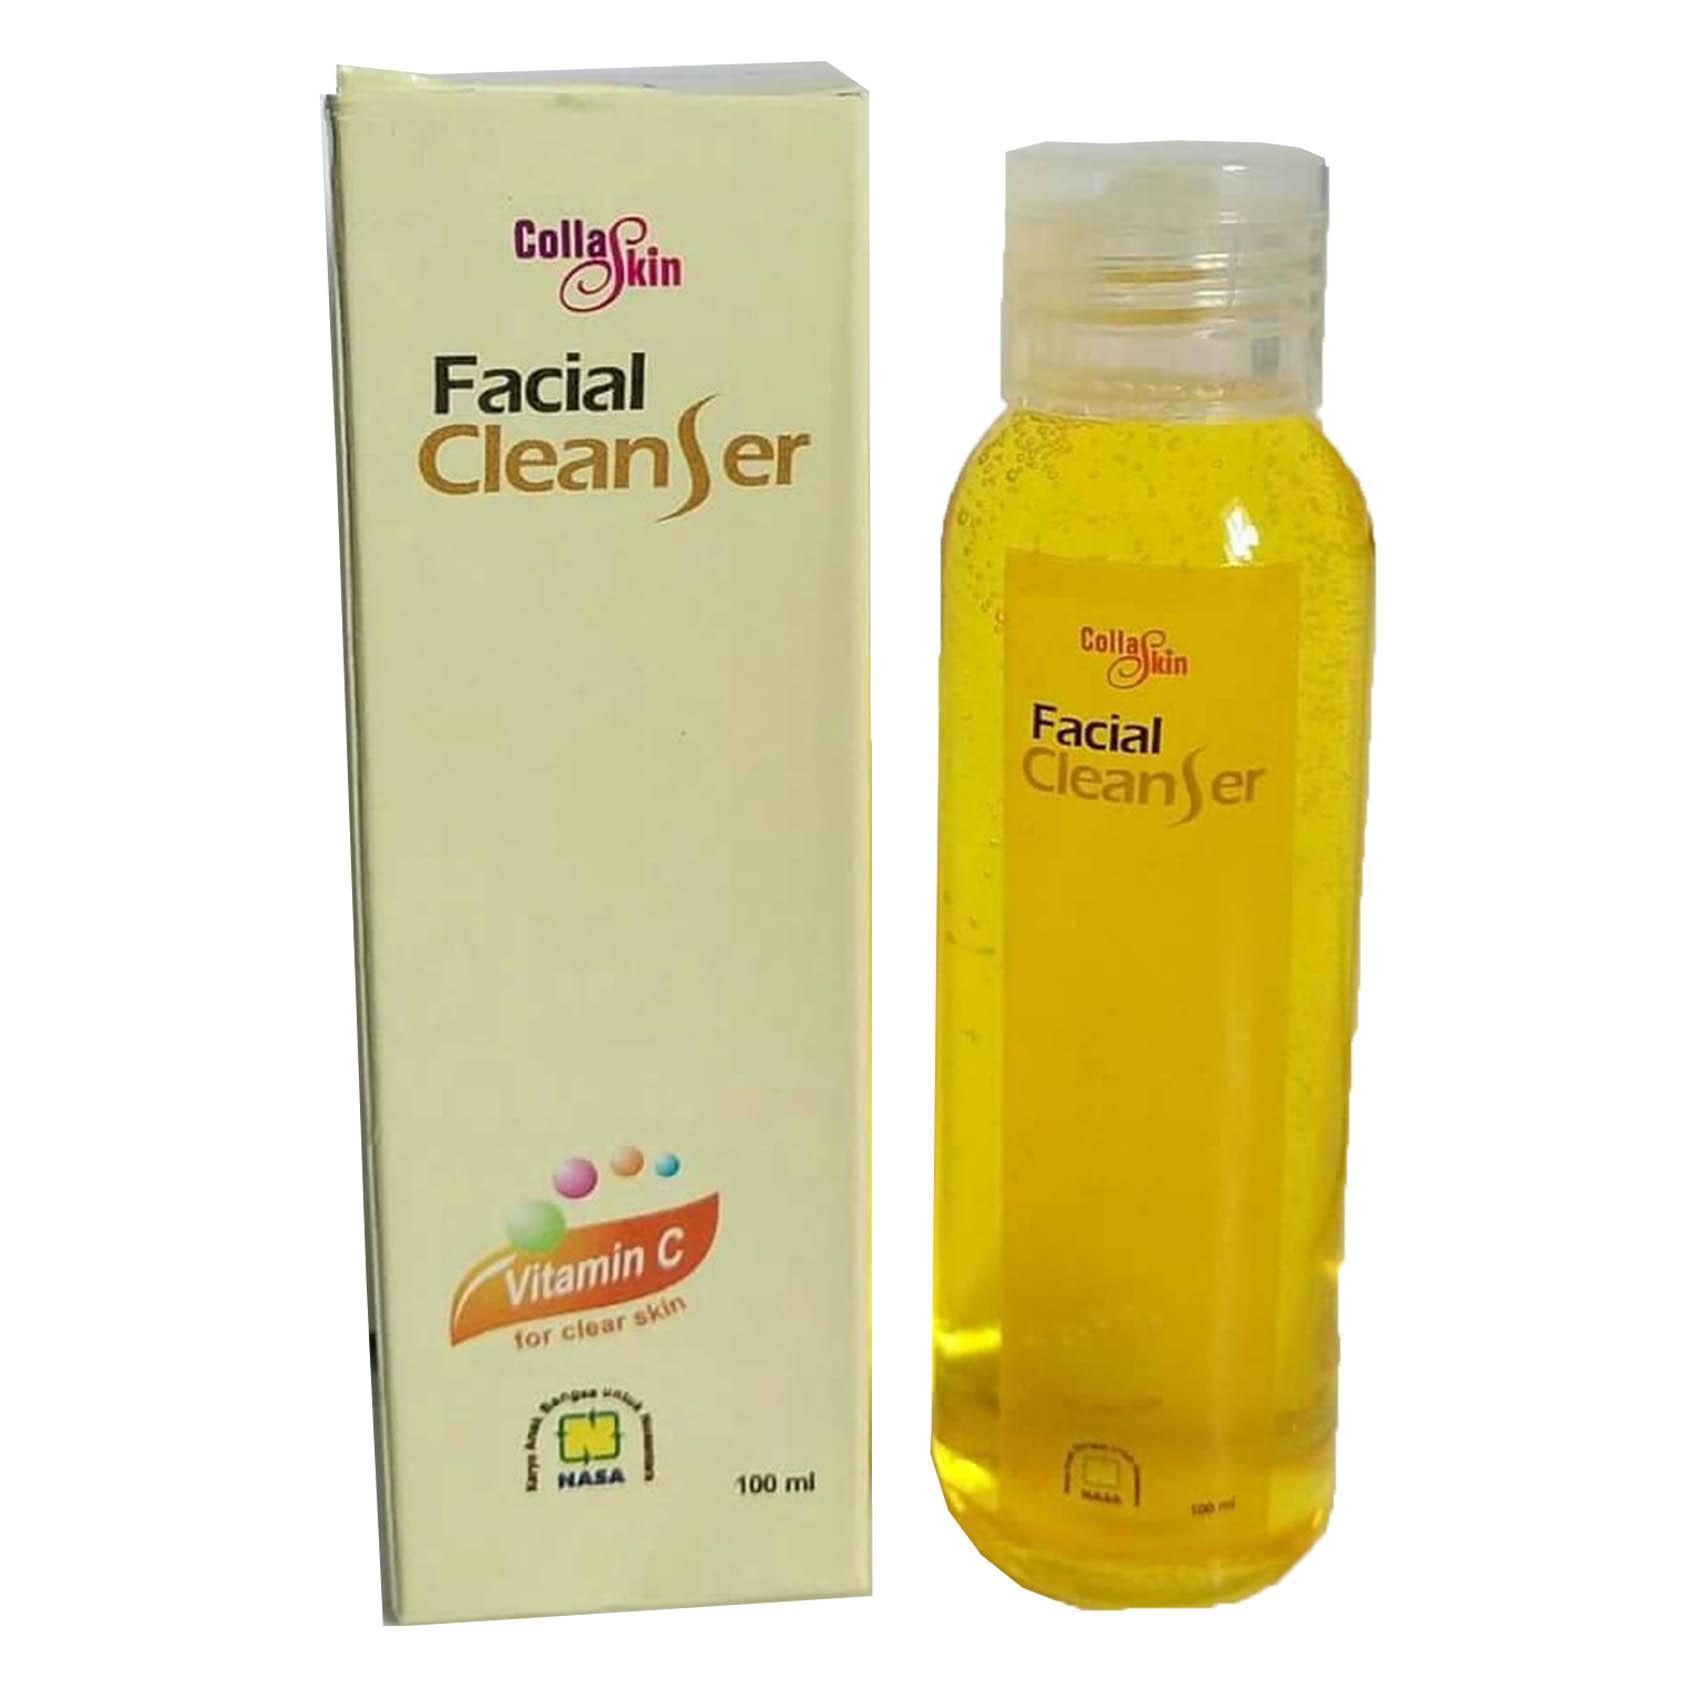 CollaSkin Facial Cleanser_